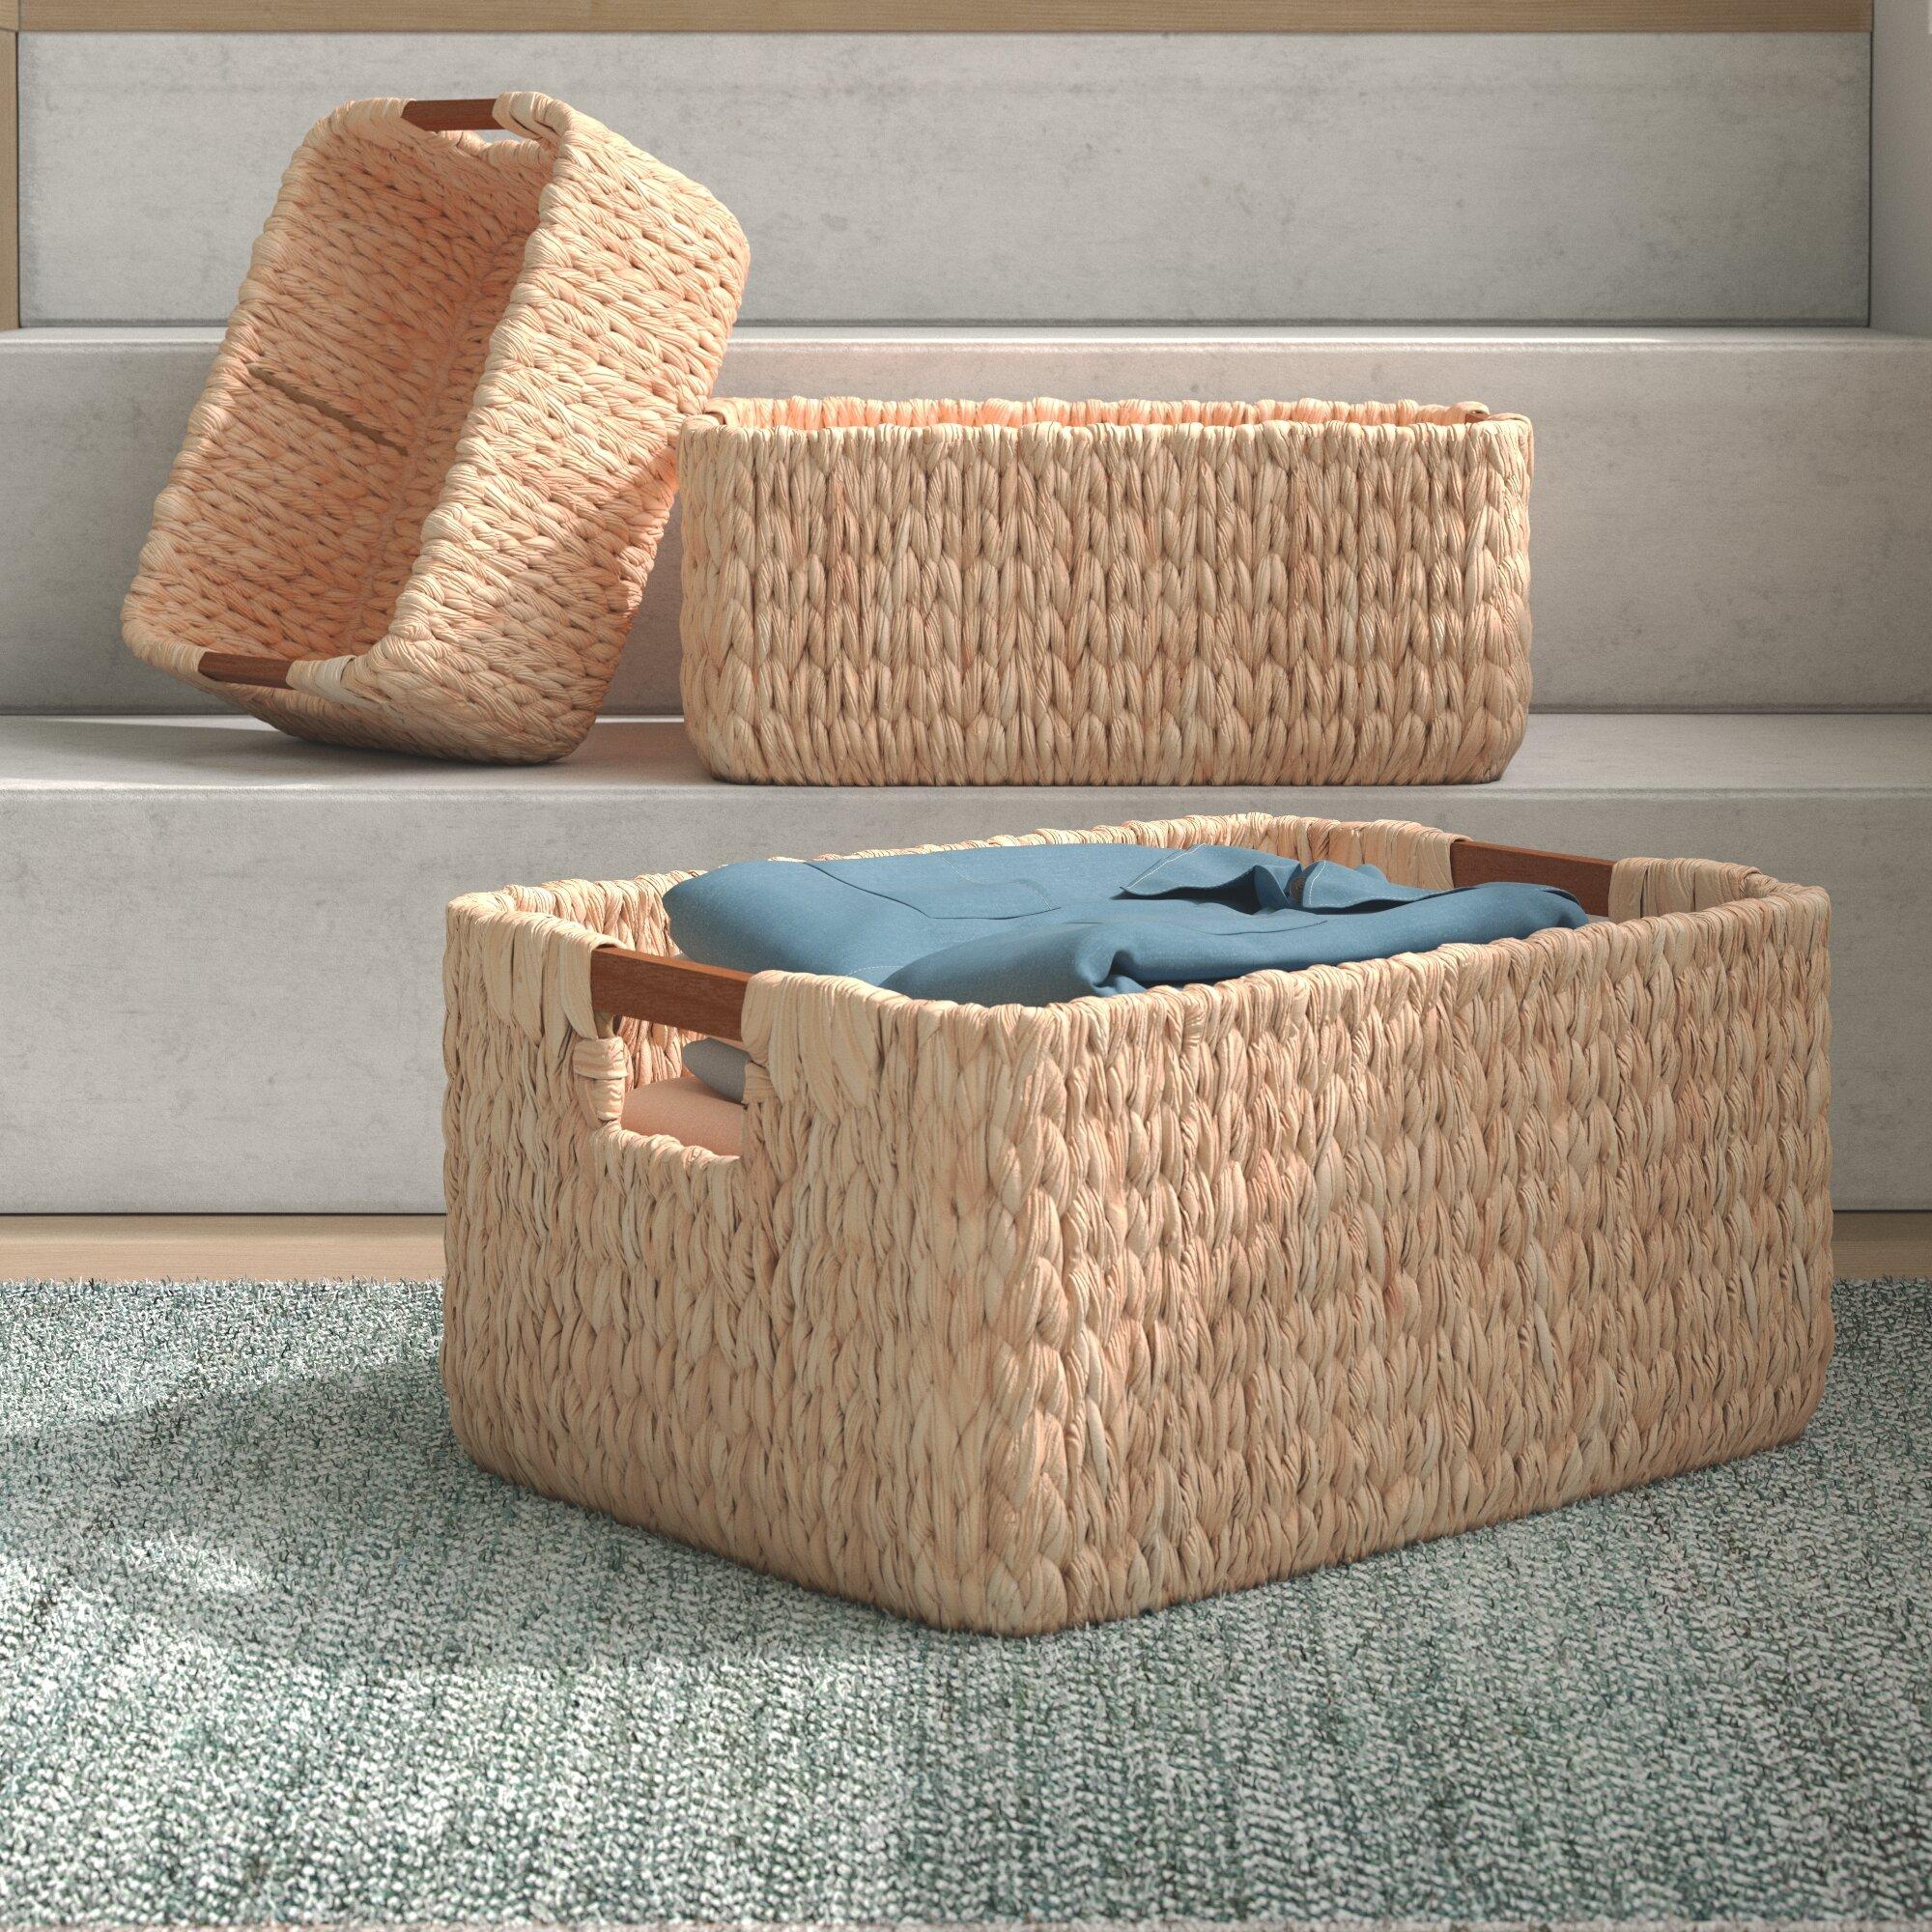 Dotted Line Janet 3 Piece Wicker Rattan Basket Set Reviews Wayfair